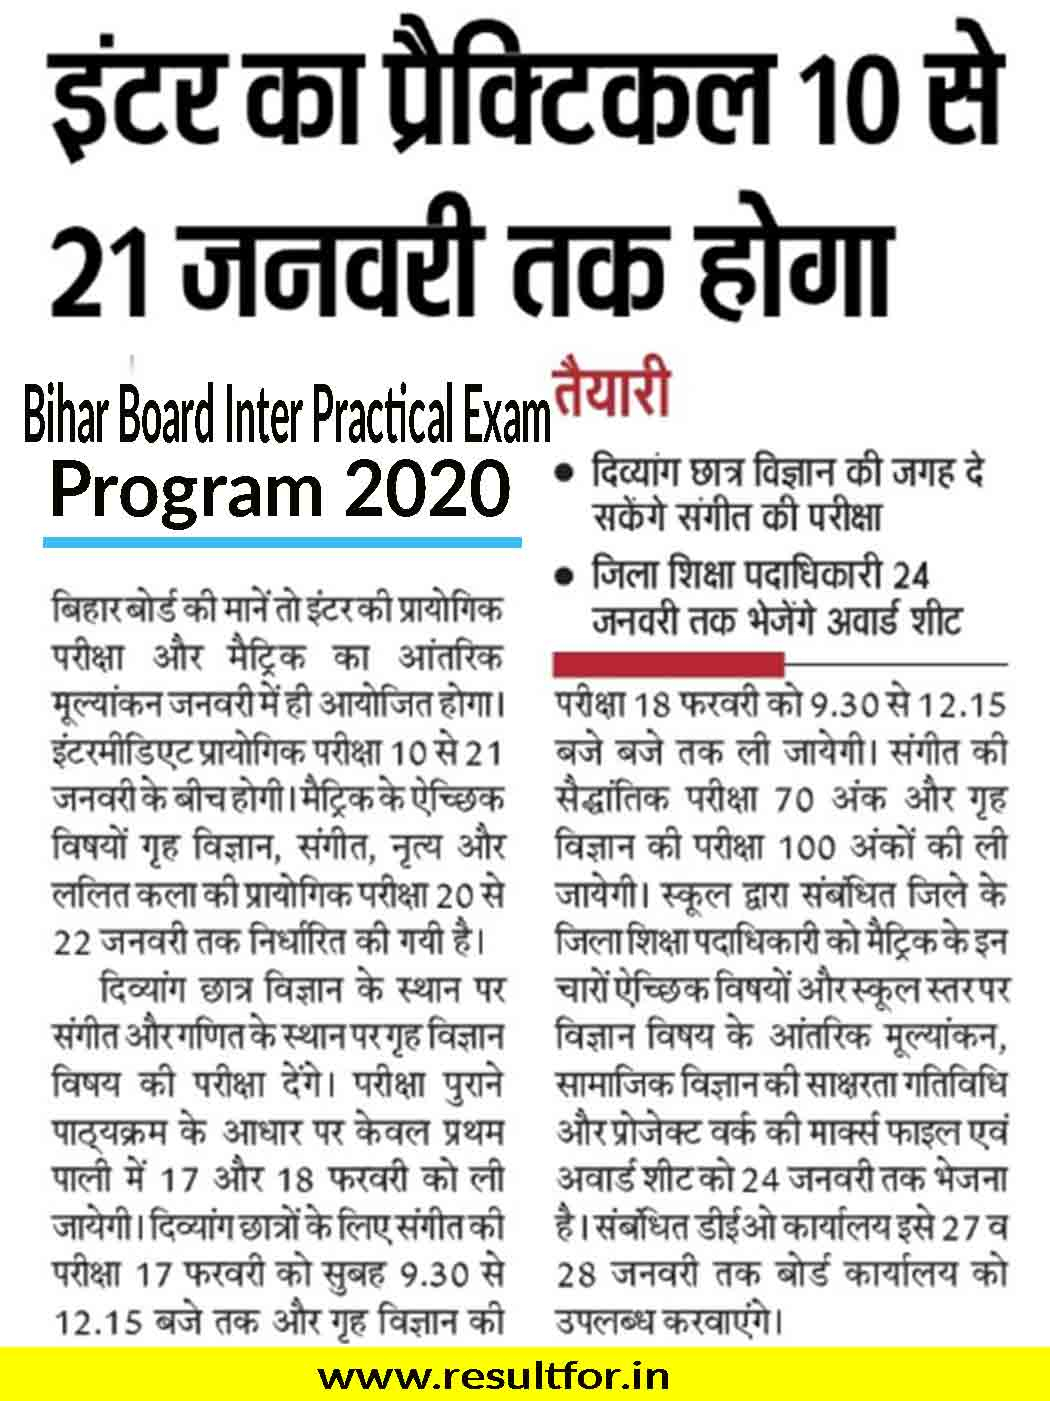 Bihar Board Inter Practical Exam Date Sheet 2020. | Bihar Board in Bihar Sarkar Calendar 2020 Pdf